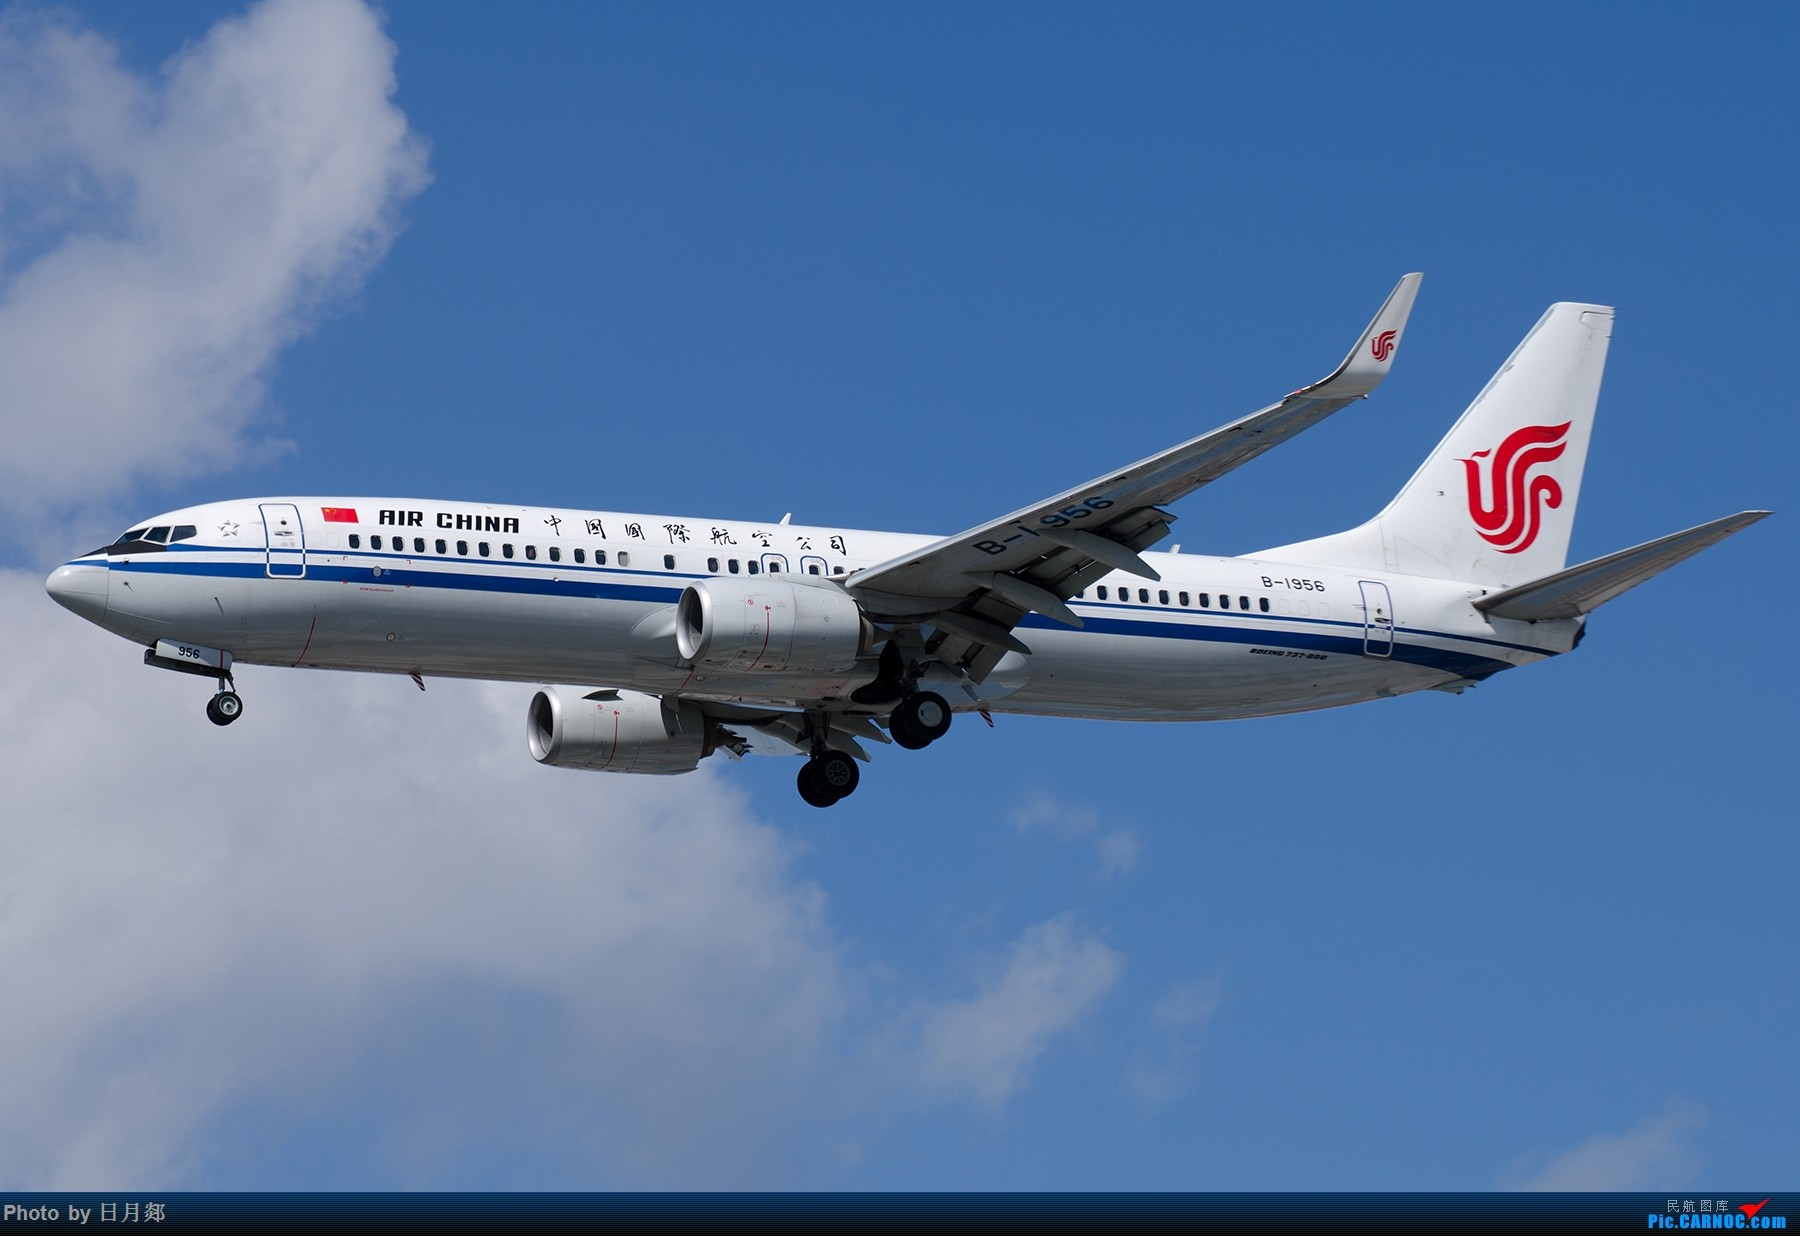 Re:[原创]【SHA拍机*1800大图】国庆的存货接着发,台风啥时候才能过去 BOEING 737-800 B-1956 中国上海虹桥国际机场